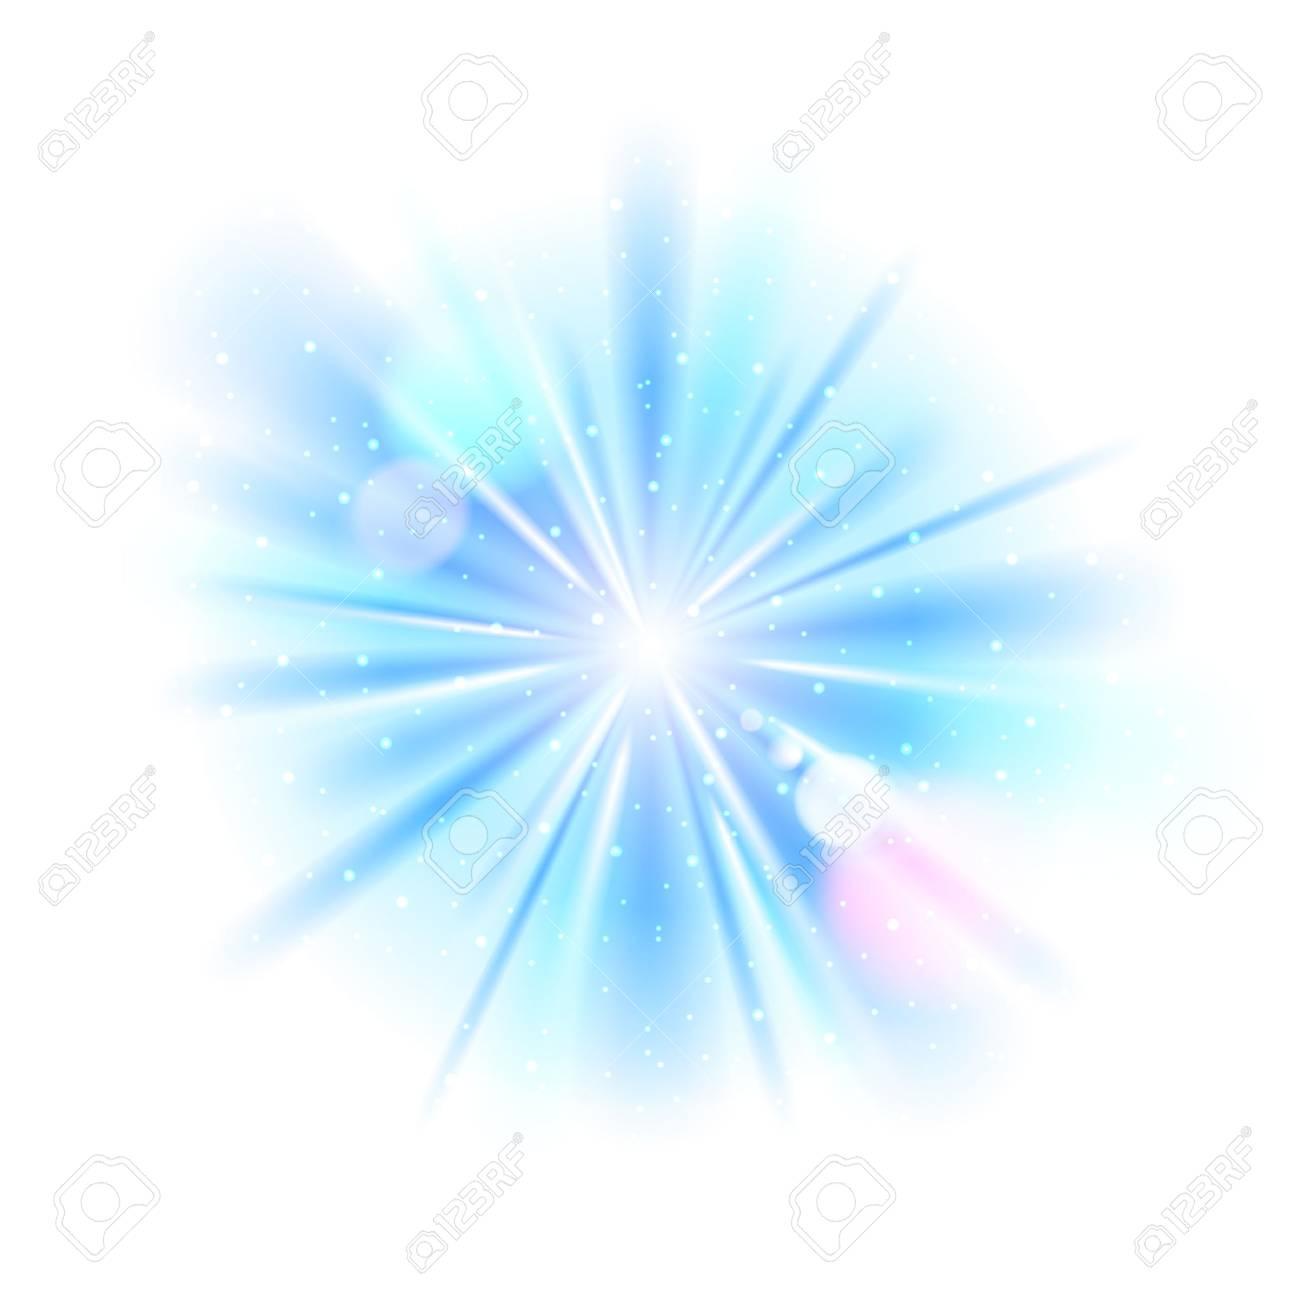 Blue light sunburst background. Vector star burst with sparkles illustration. - 52985158